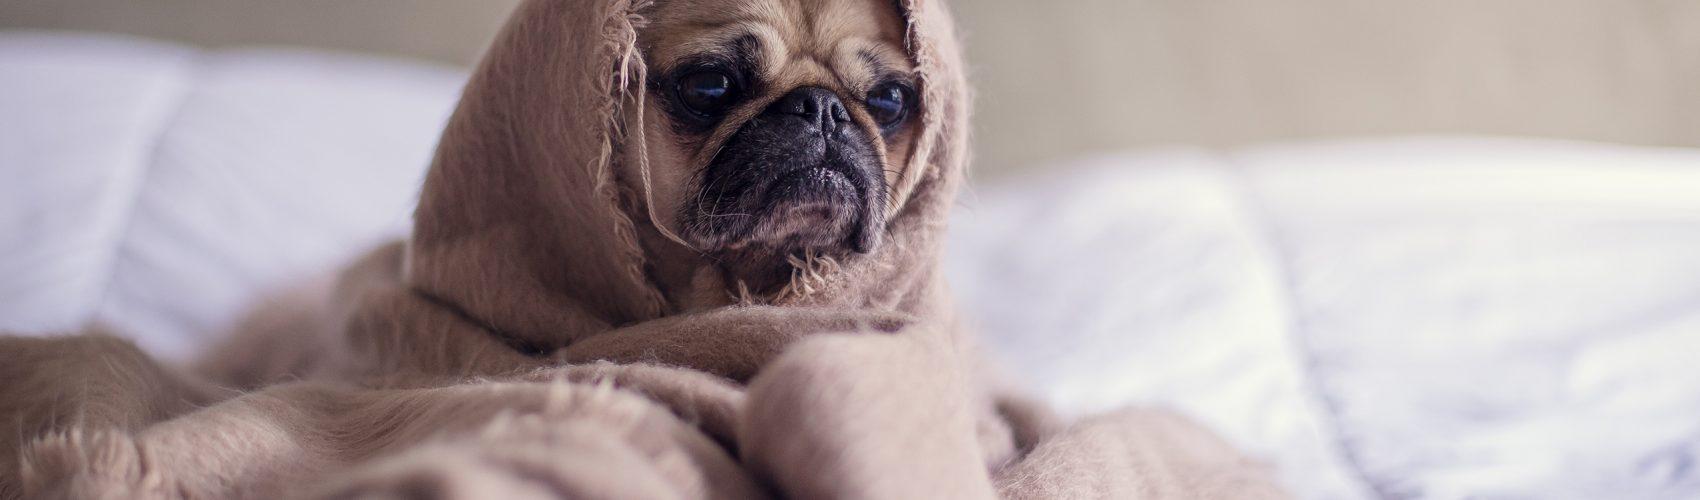 Pug Making Life Decisions for Blog